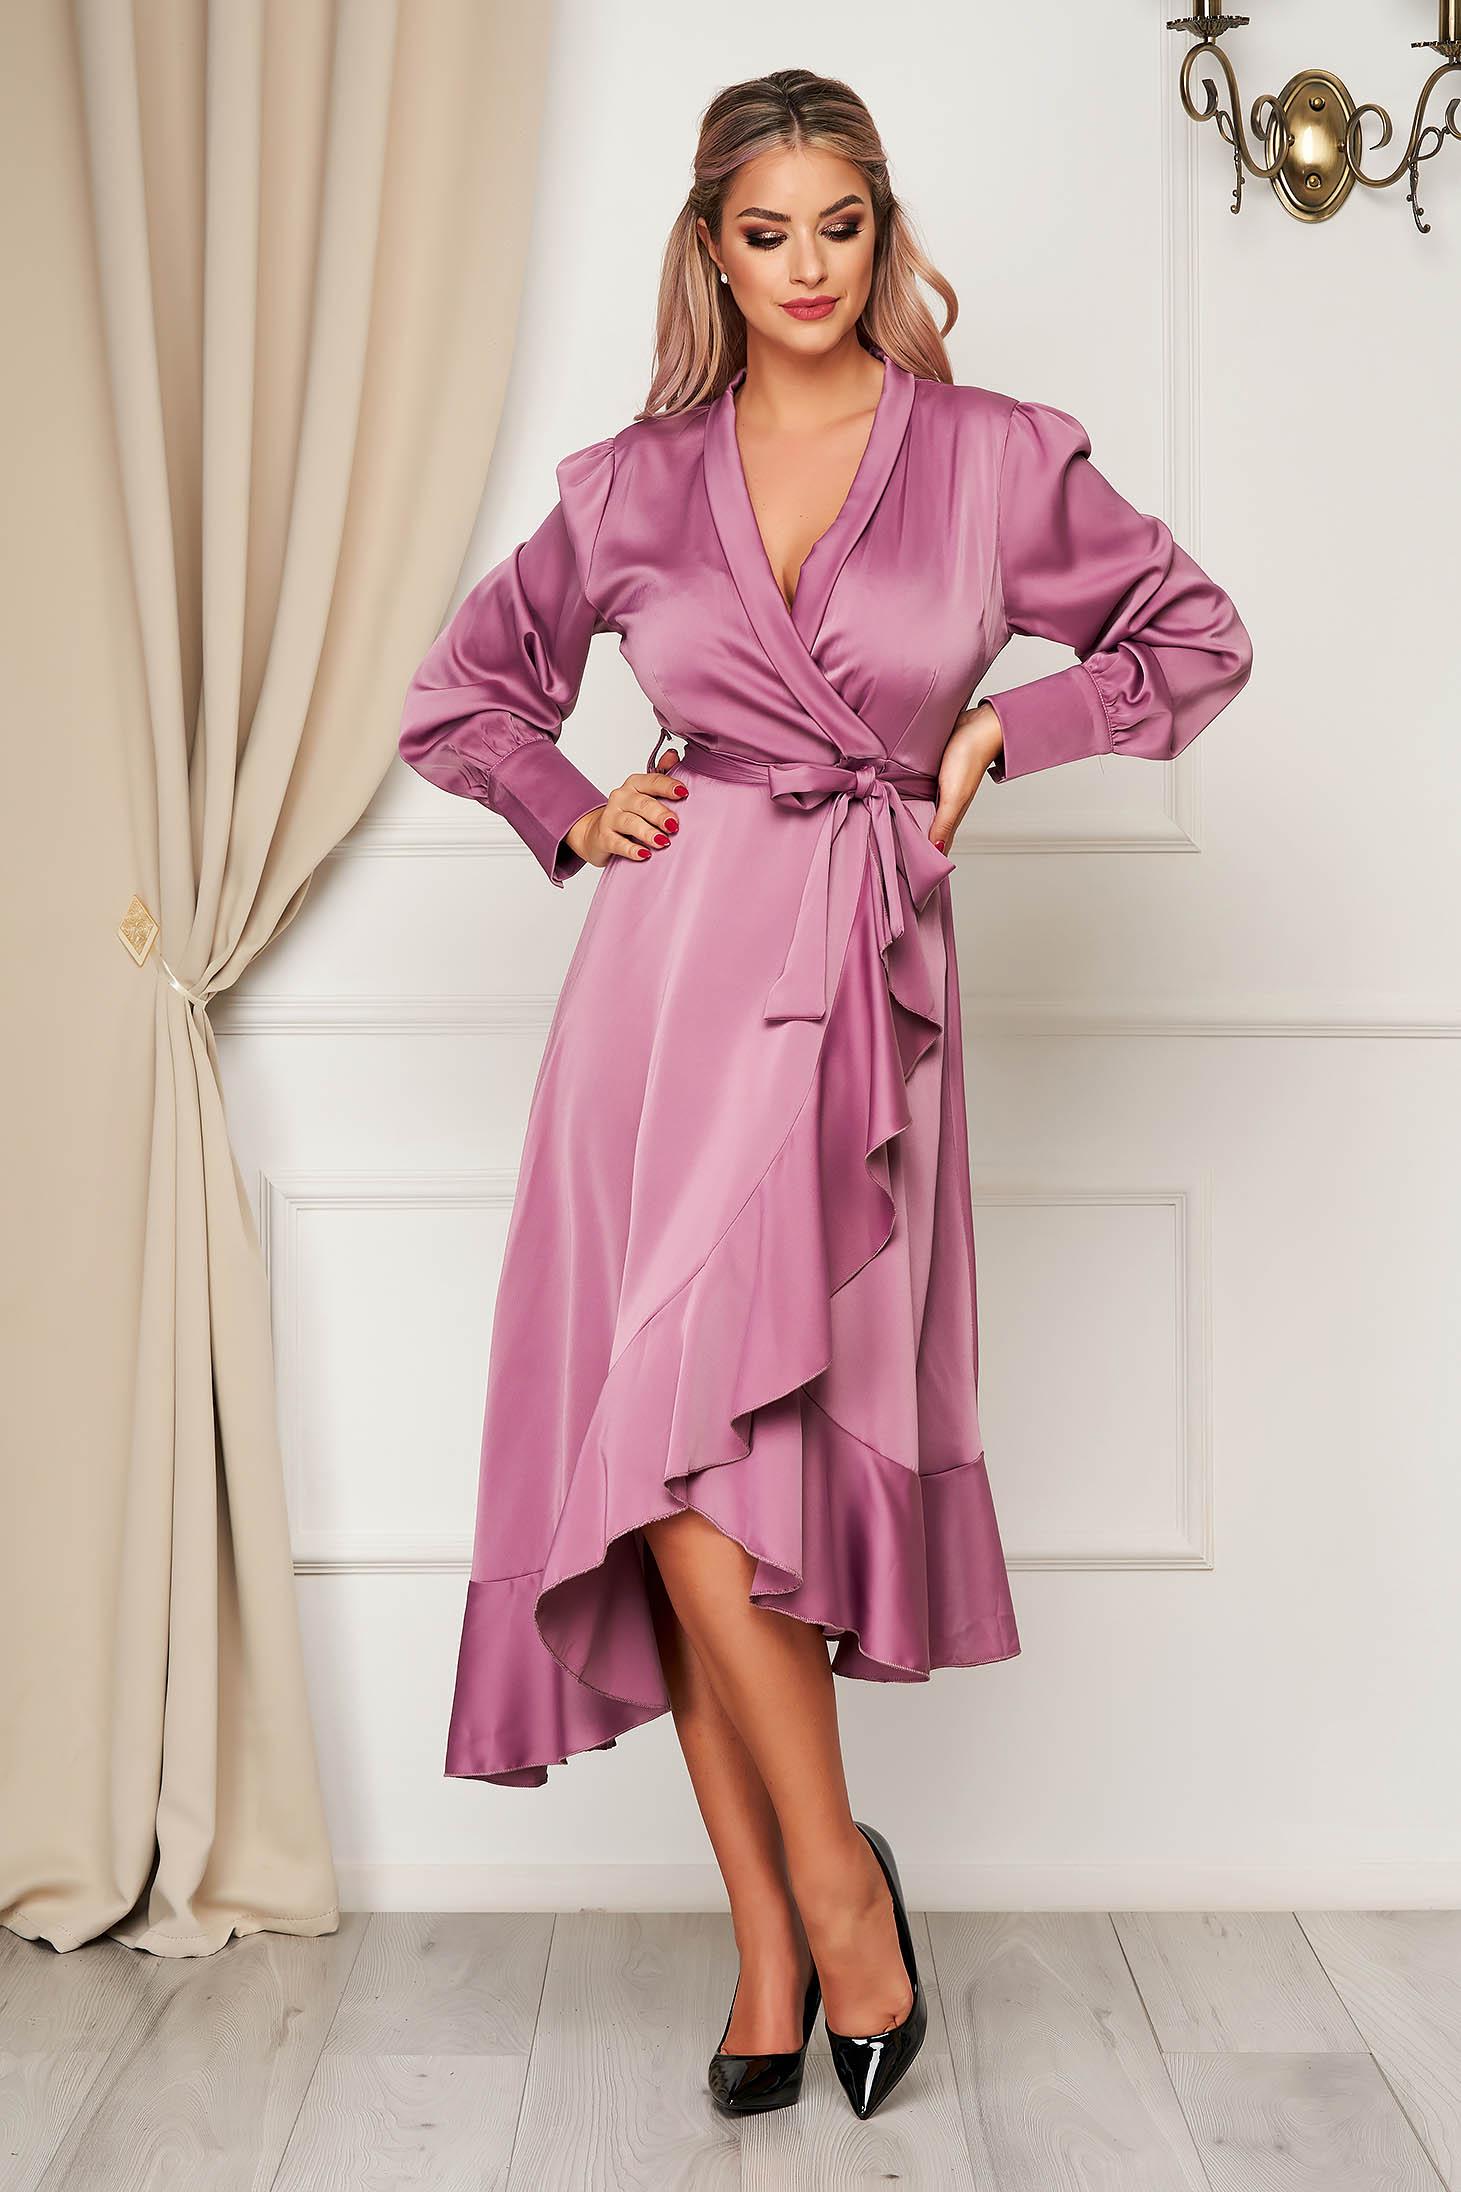 Rochie SunShine lila eleganta in clos decolteu petrecut din material satinat cu volanase la baza rochiei accesorizata cu cordon